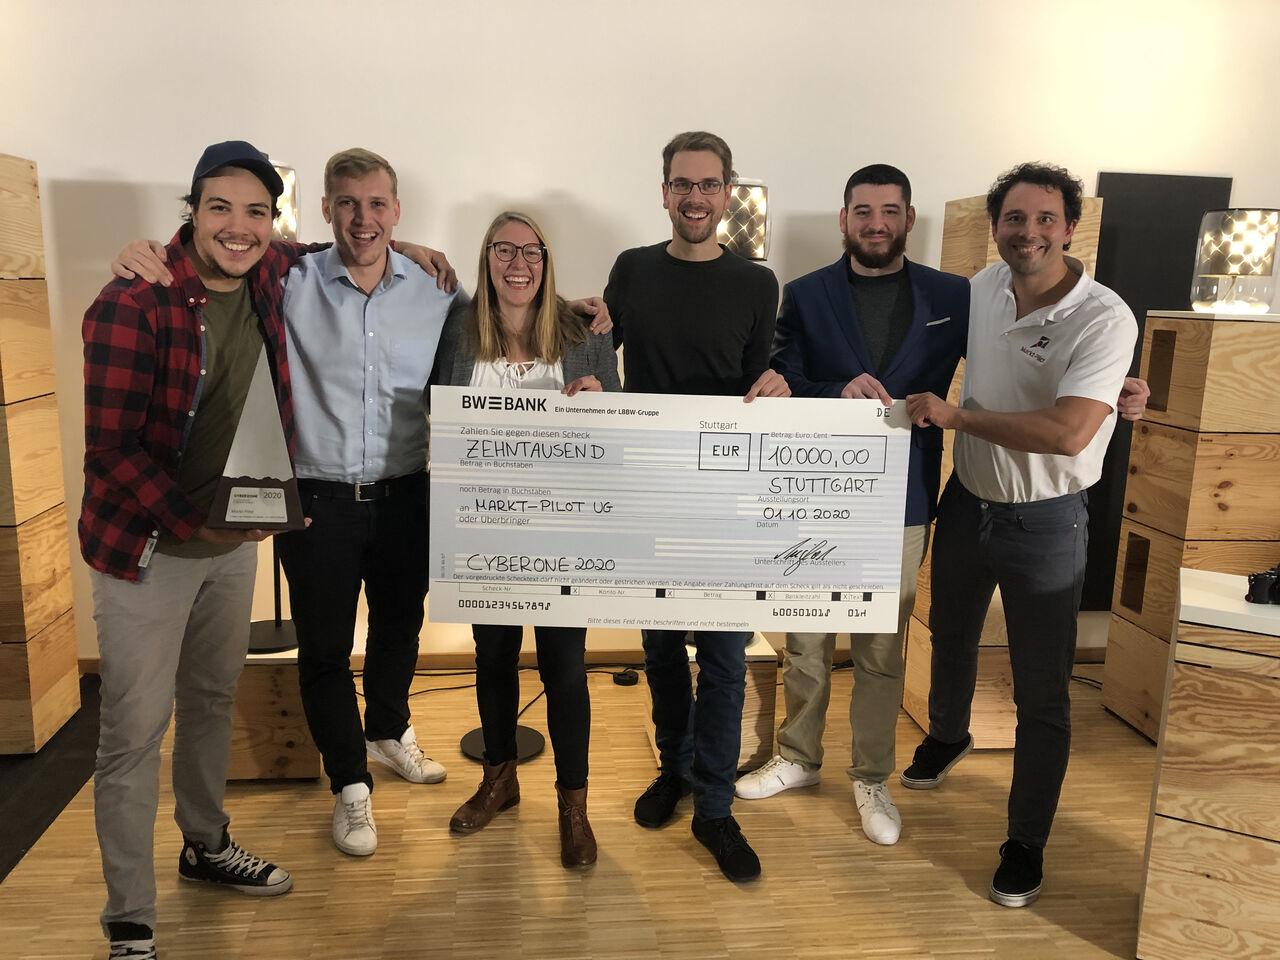 Sieg beim CyberOne Award